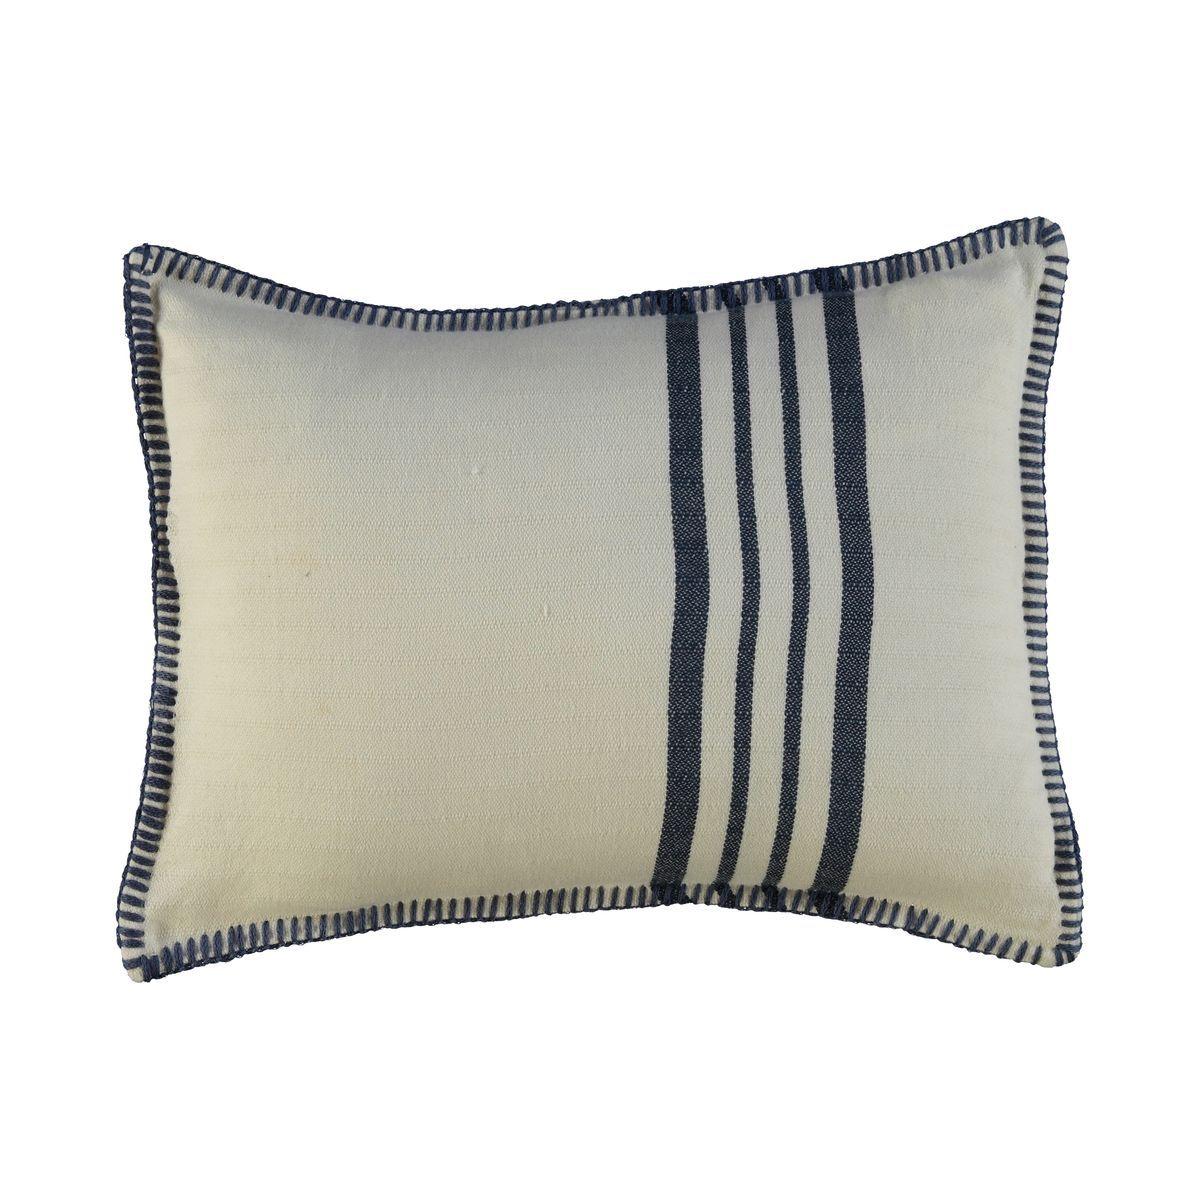 Cushion Cover Sultan - Navy Stripes / 30x40